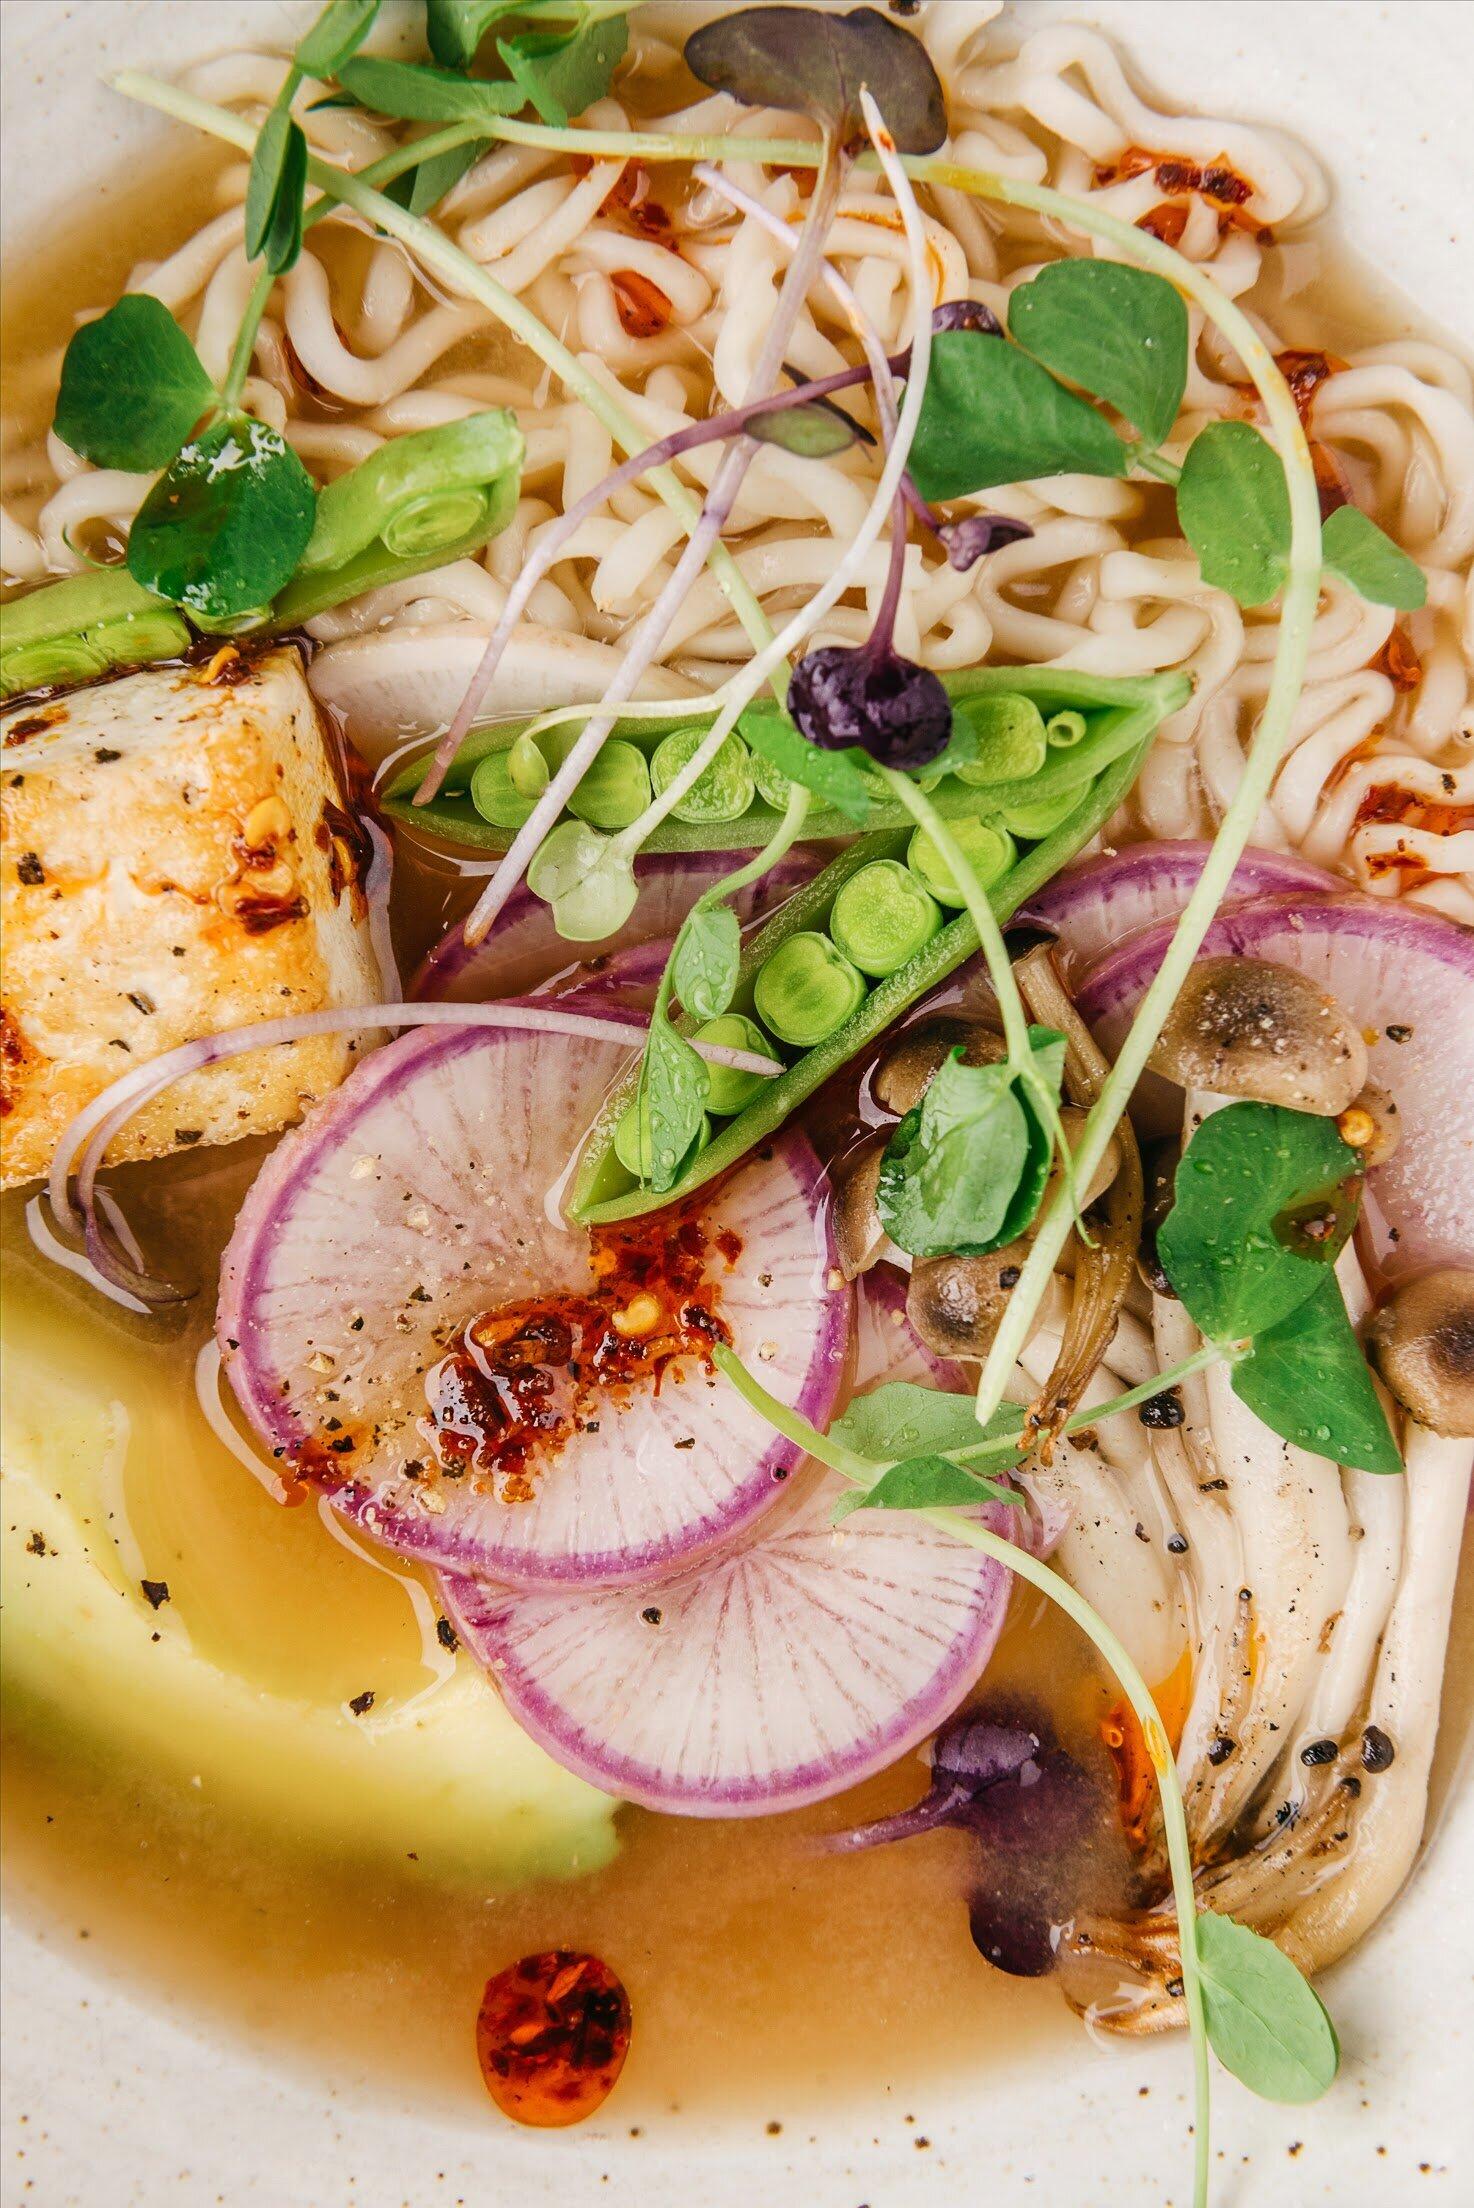 EASY MISO RAMEN (WITH TOFU, AVOCADO AND CHILE SAUCE) #easydinner #ramen #noodles #sarahcopeland #healthydinner